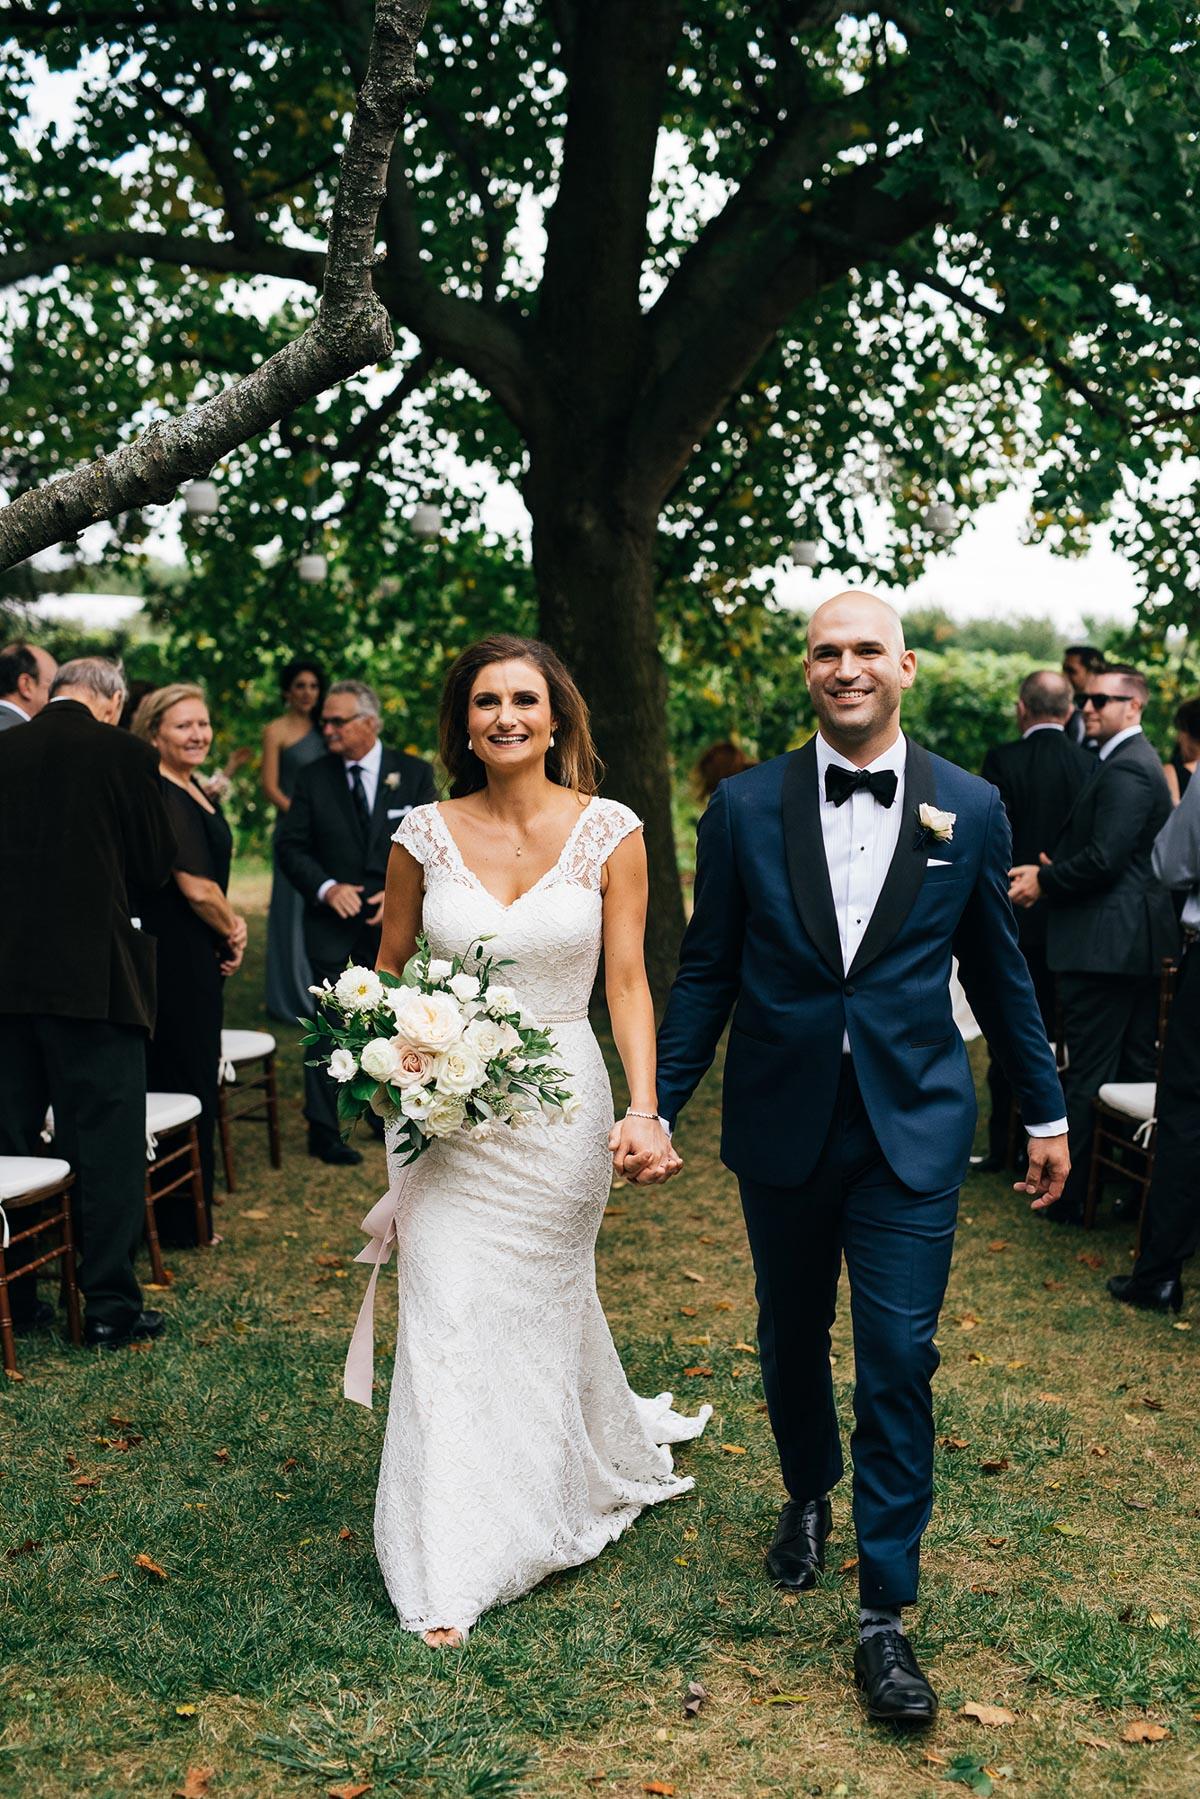 shaw-events-vineyard-bride-swish-list-kurtz-orchards-niagara-on-the-lake-wedding-22.jpg